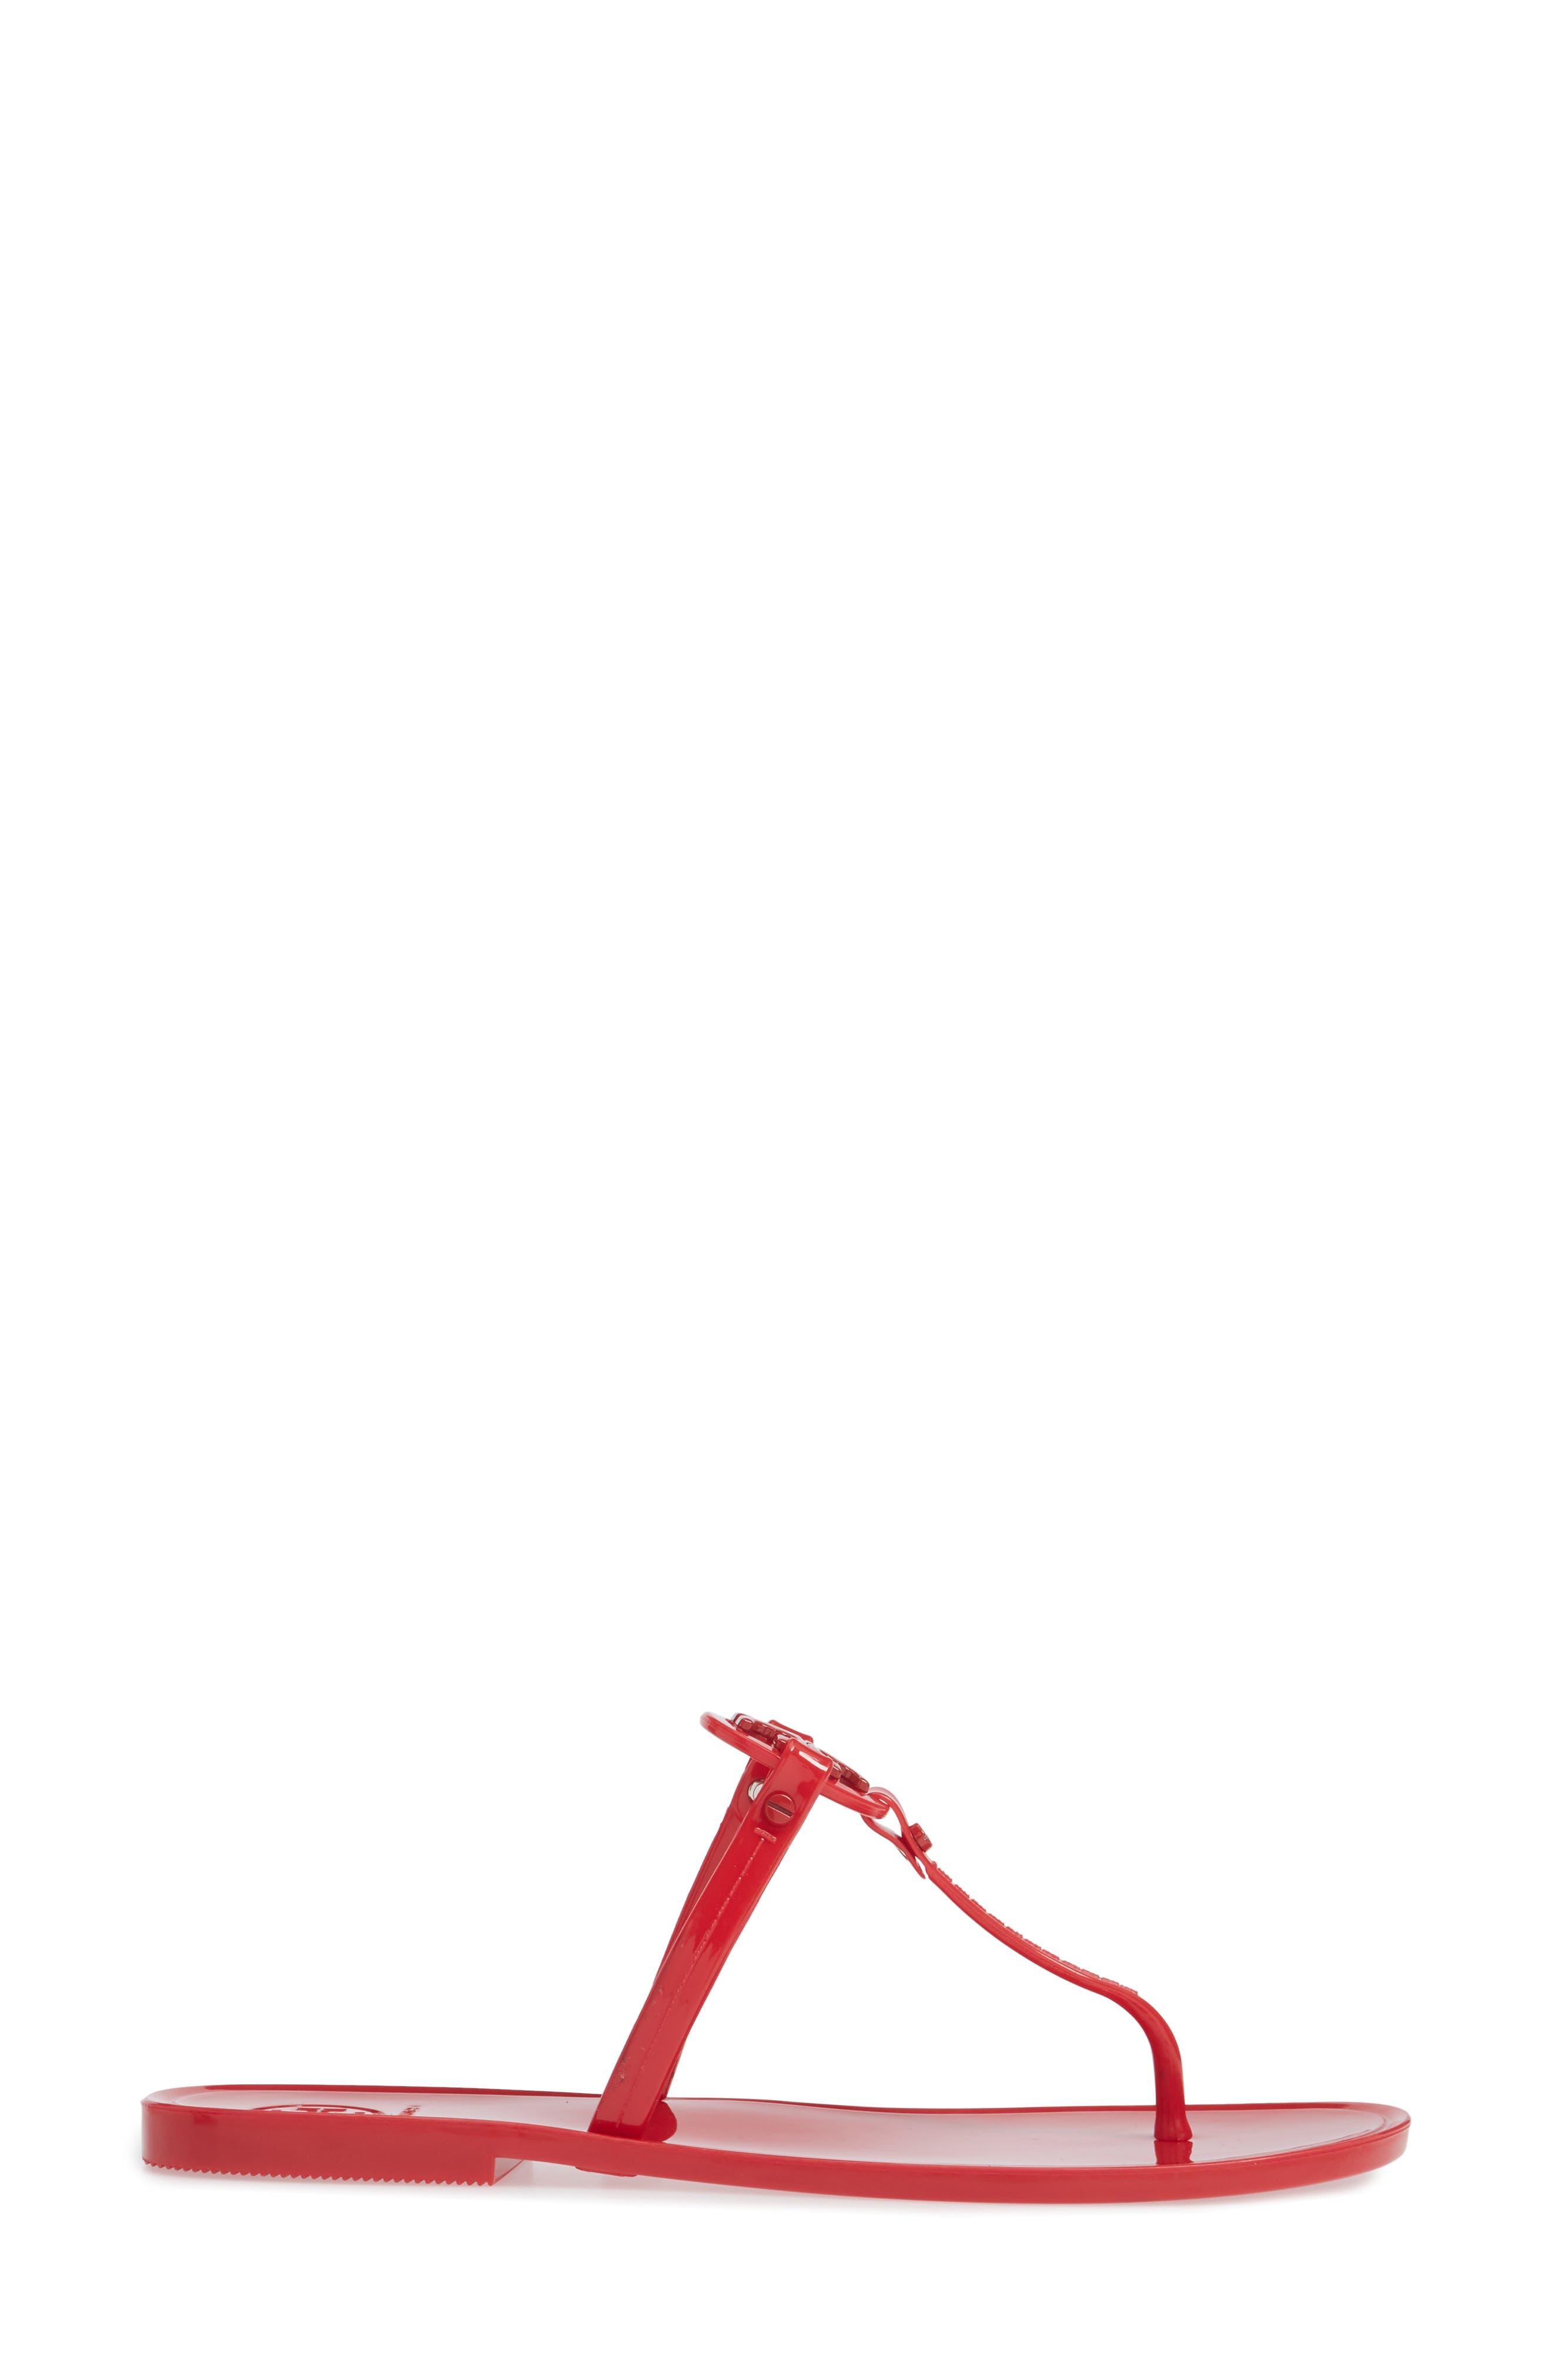 'Mini Miller' Flat Sandal,                             Alternate thumbnail 3, color,                             BRILLIANT RED